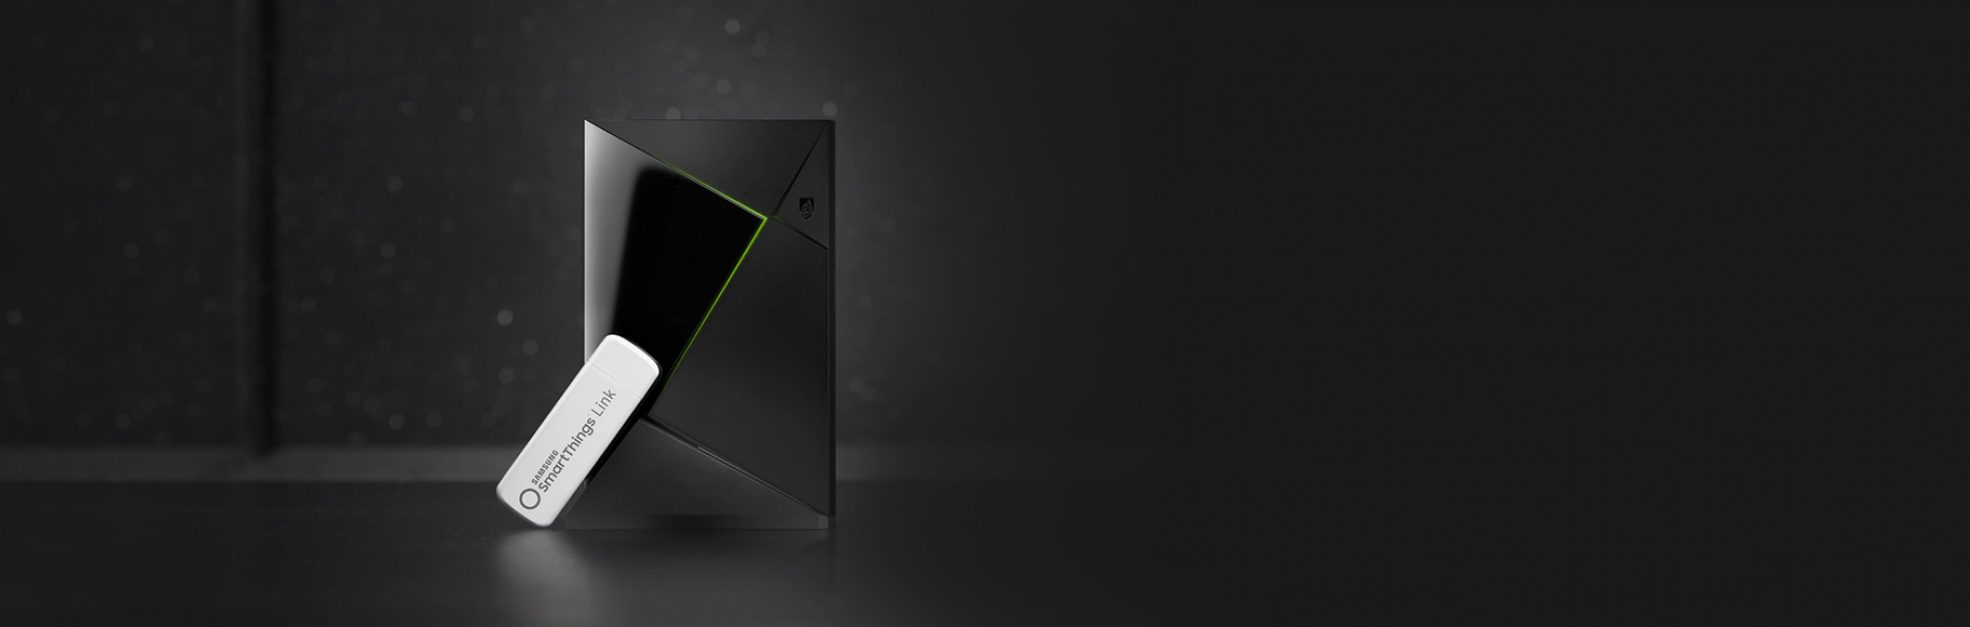 shield-smart-home-samsung-2560x580-ud